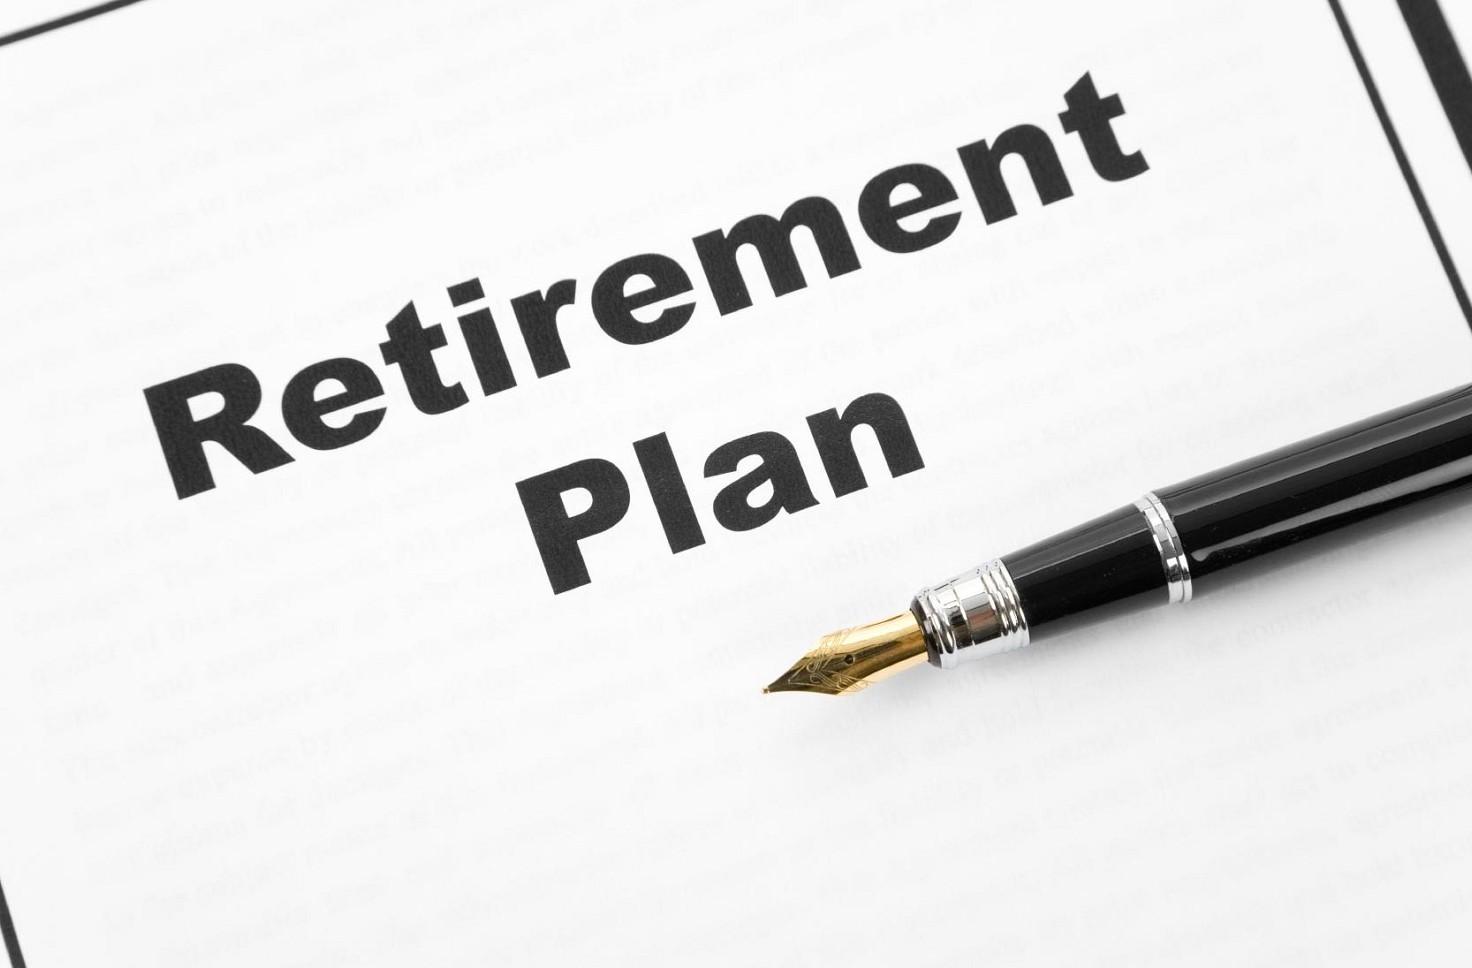 Pensioni novità Ape Social, Quota 41 blo